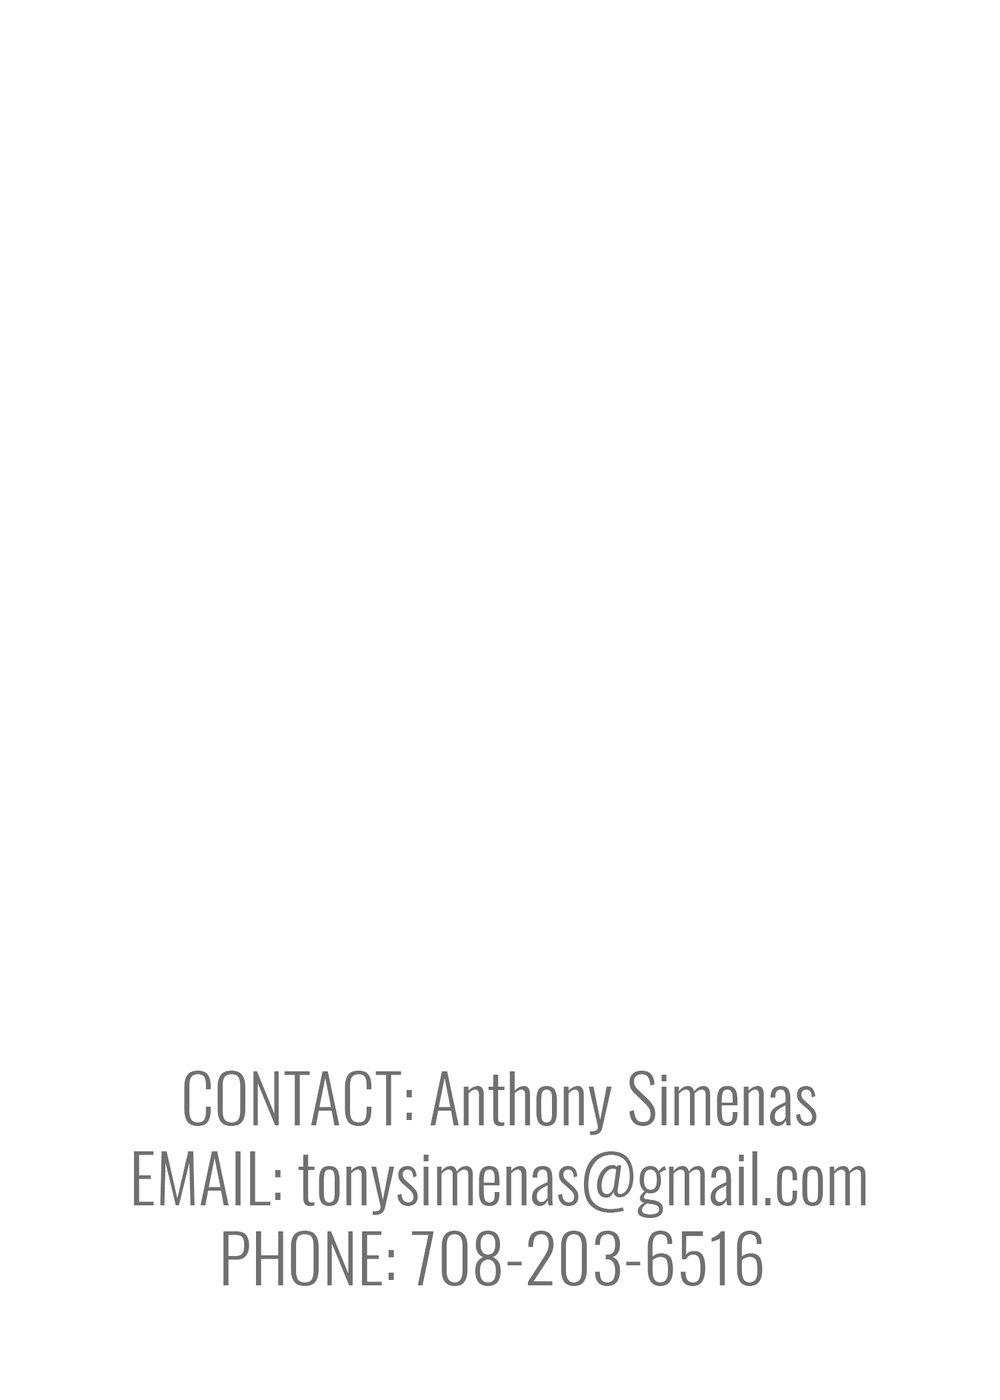 Simenas Contact.jpg